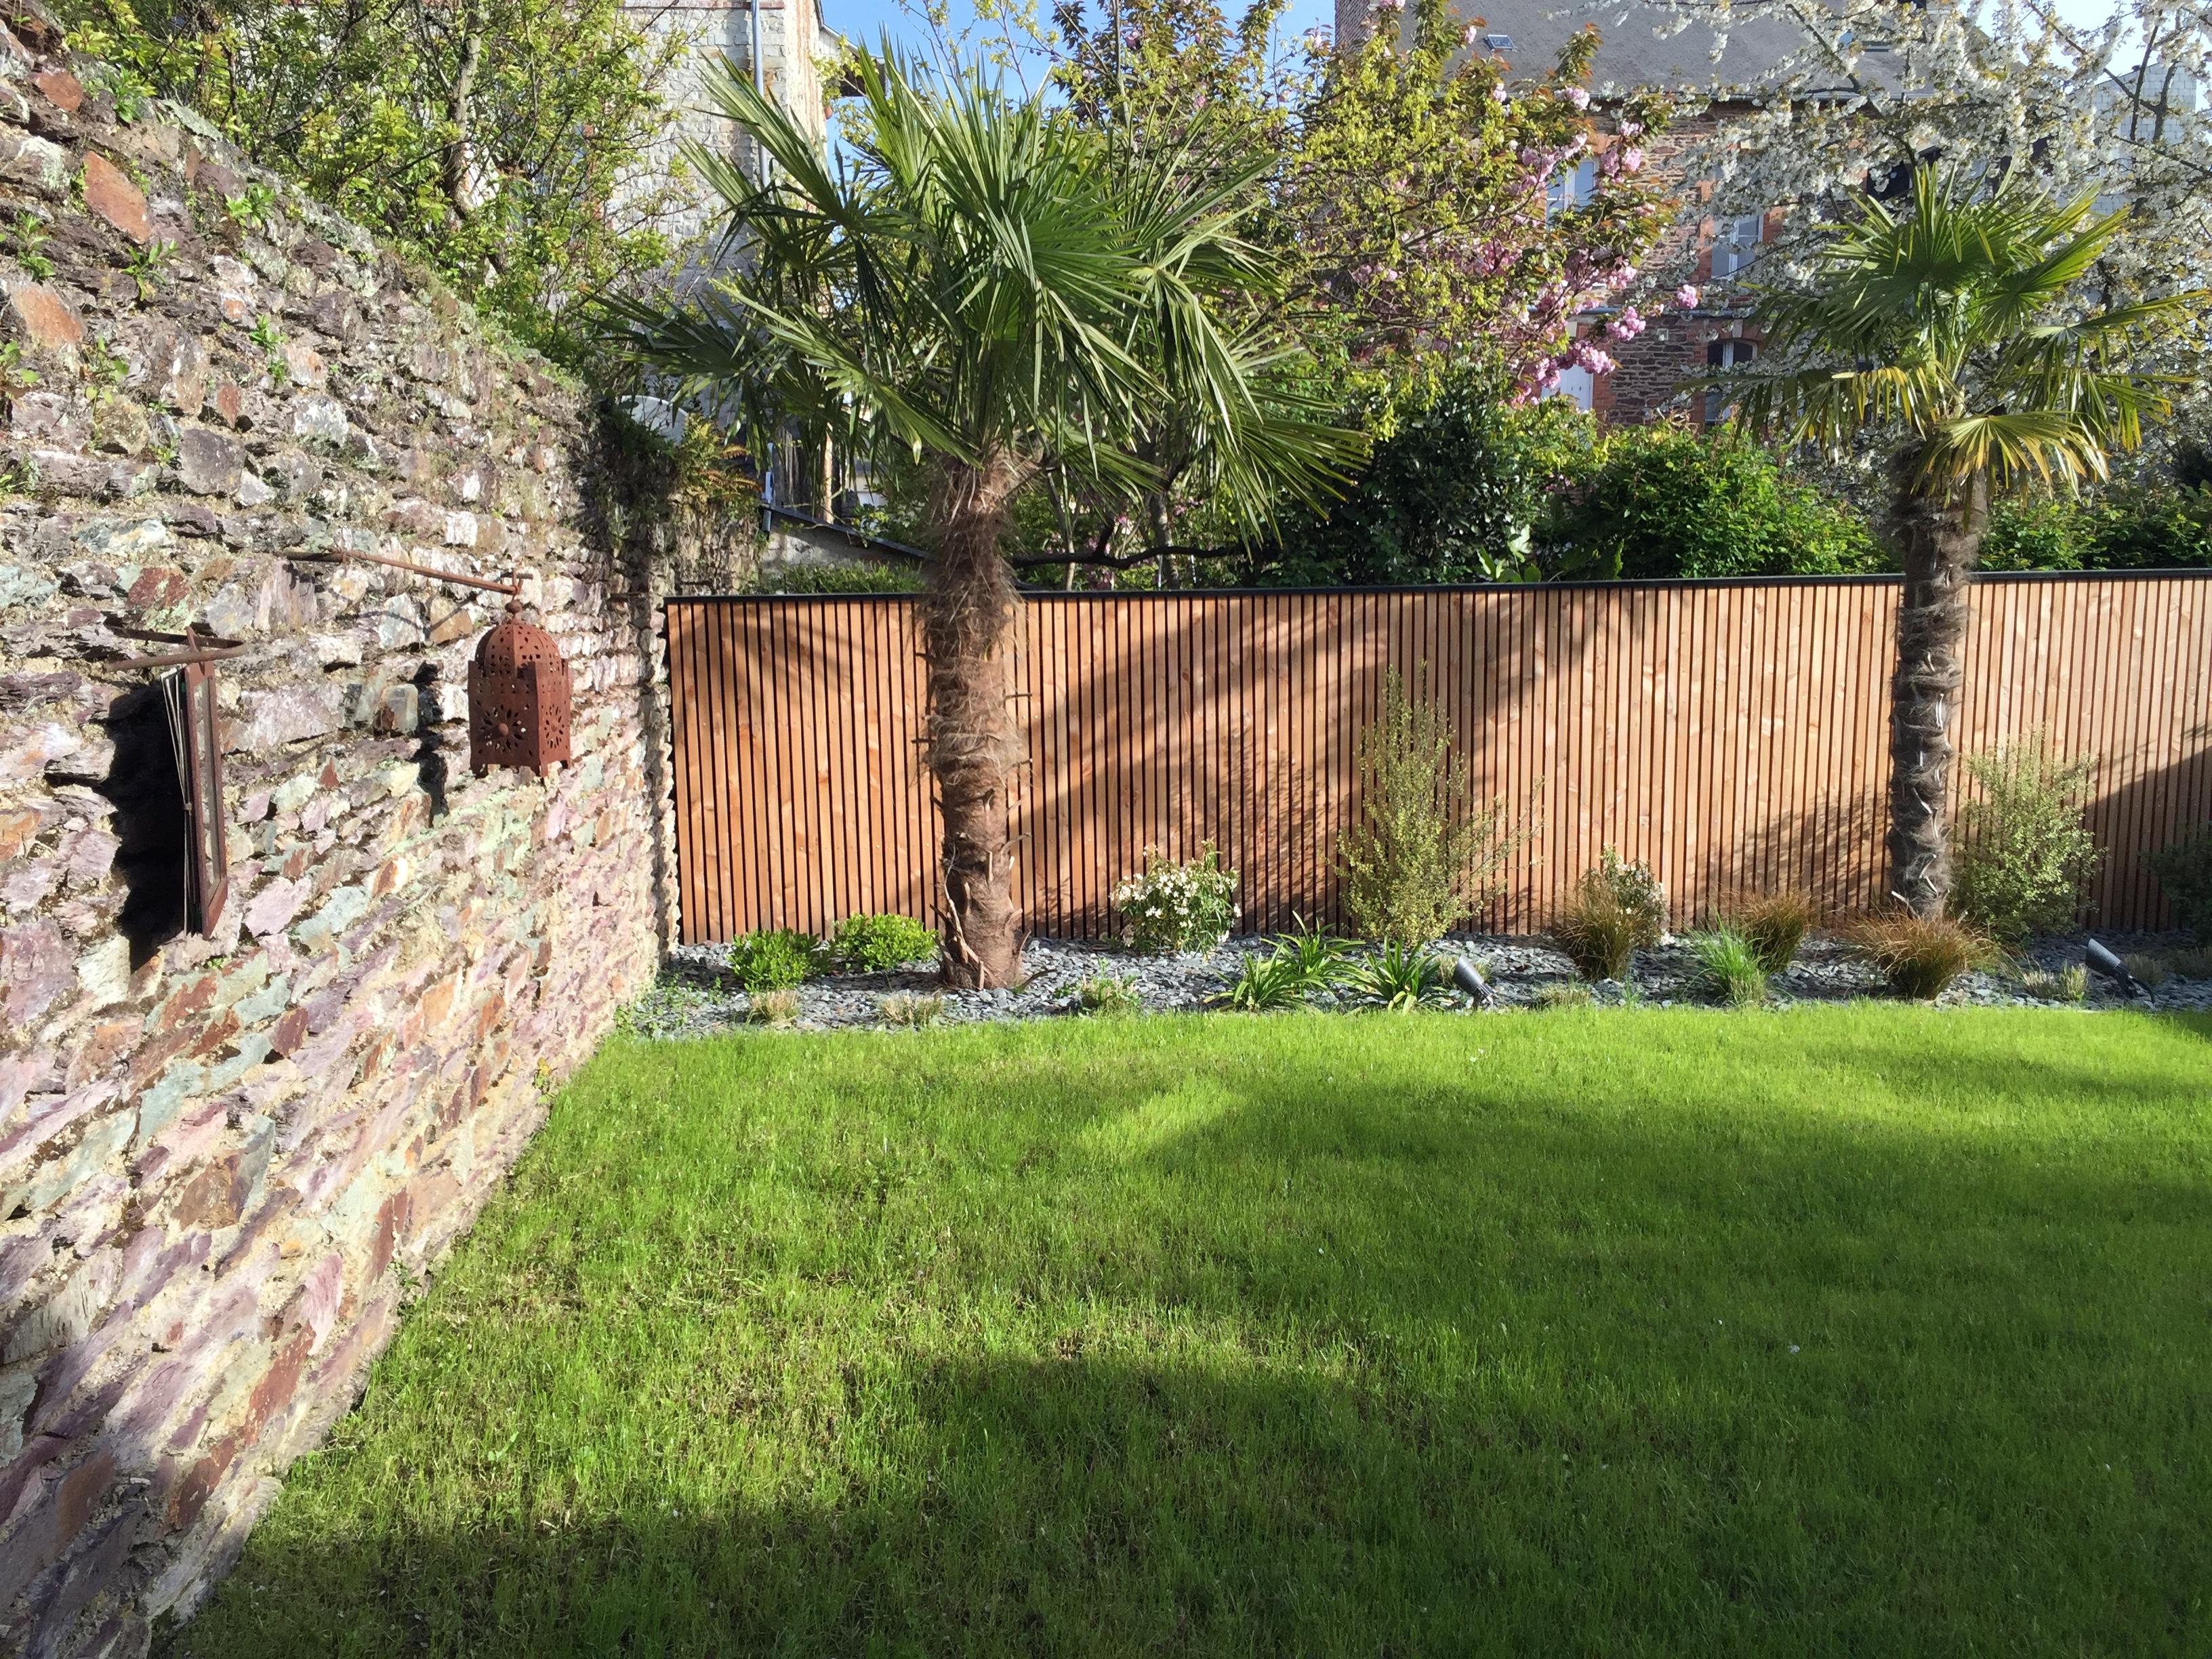 Aménagement de jardin - Rennes (35)